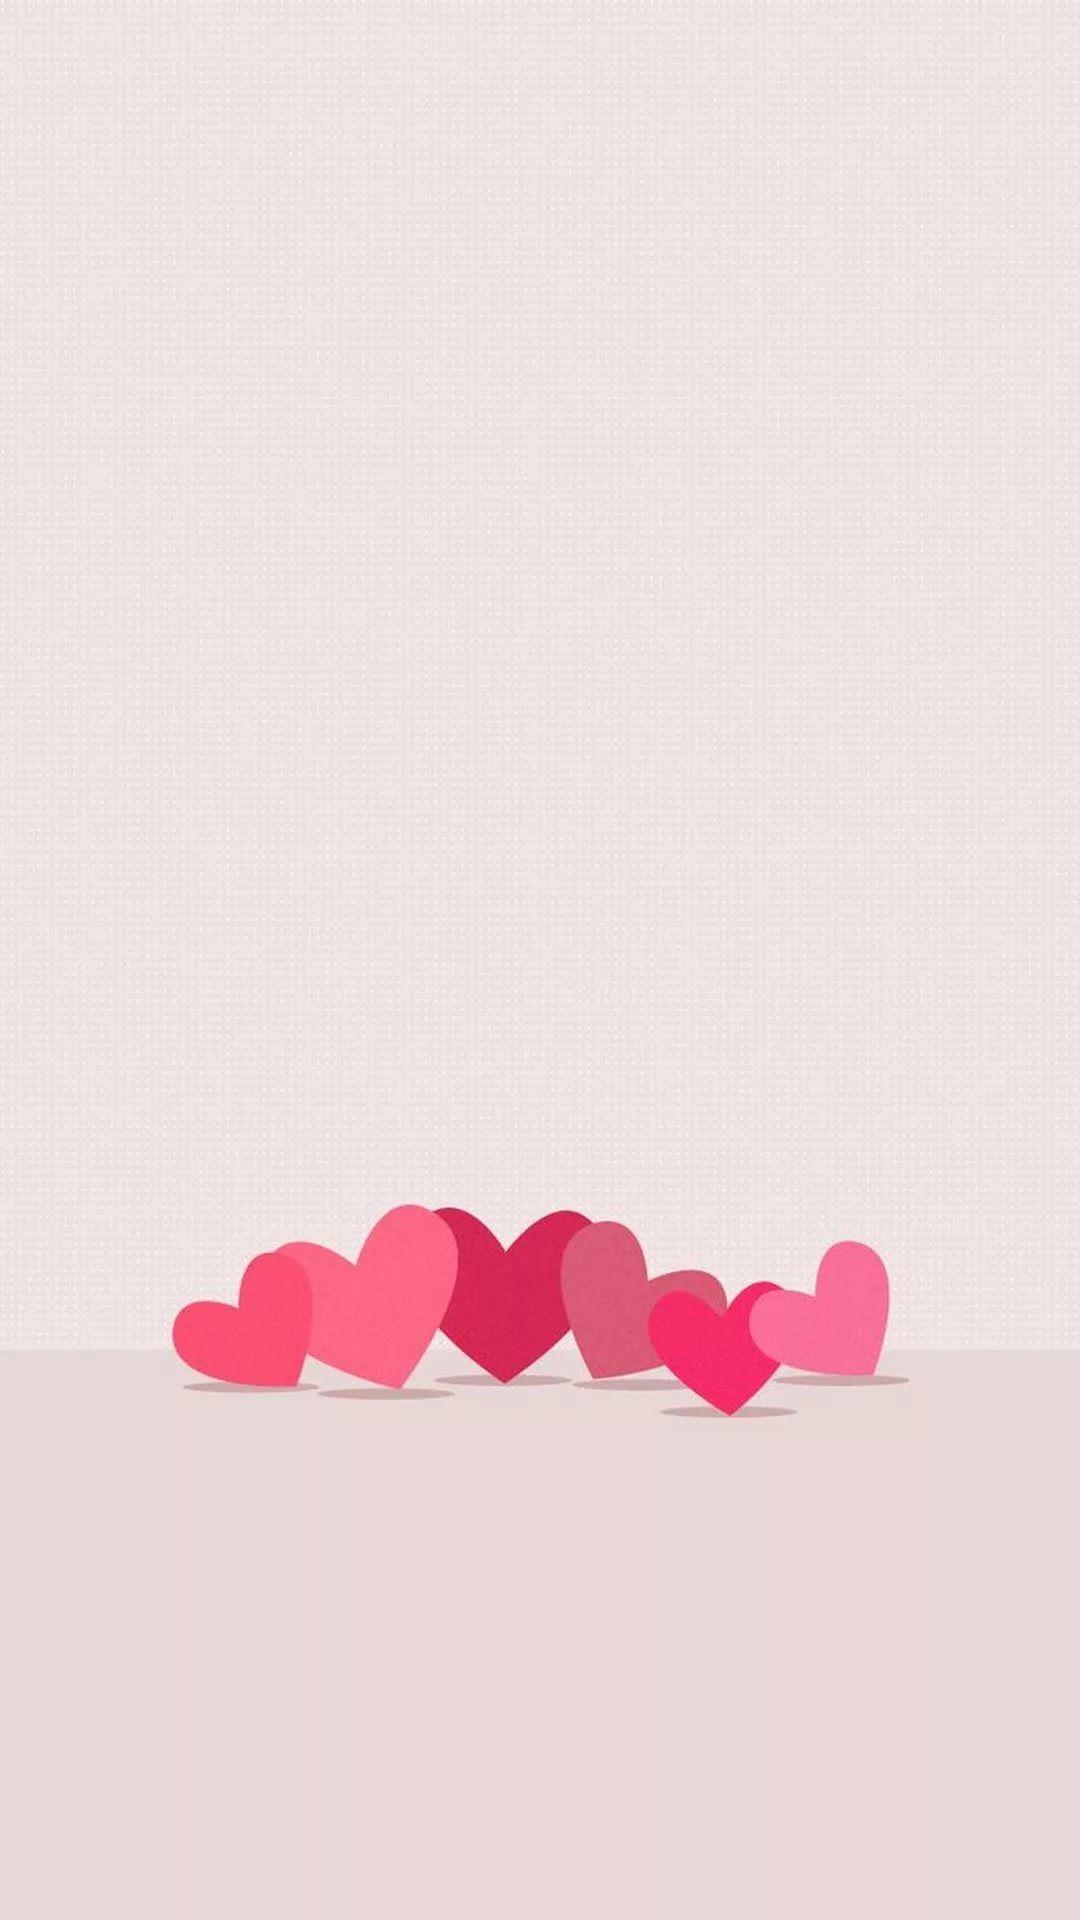 Cute Love iPhone 6s wallpaper